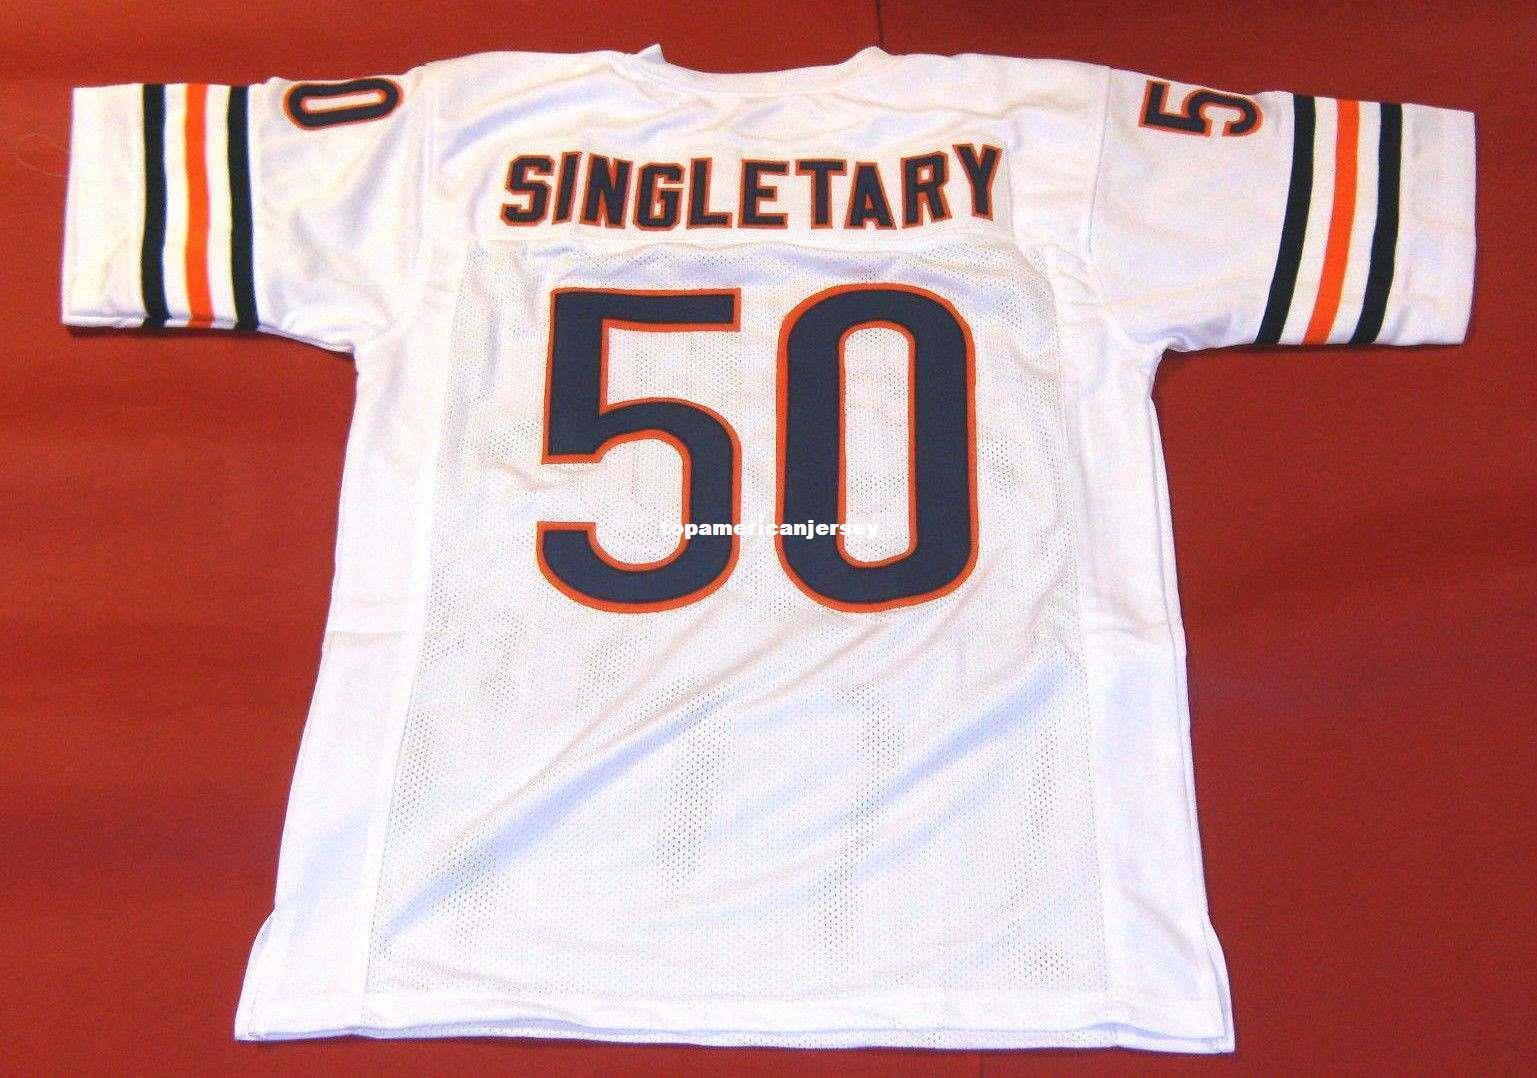 Ucuz # 50 MIKE Singletary ÖZEL MITCHELL NESS Jersey beyaz Mens Dikiş Üst S-5XL, 6XL Futbol Formalar Running Retro